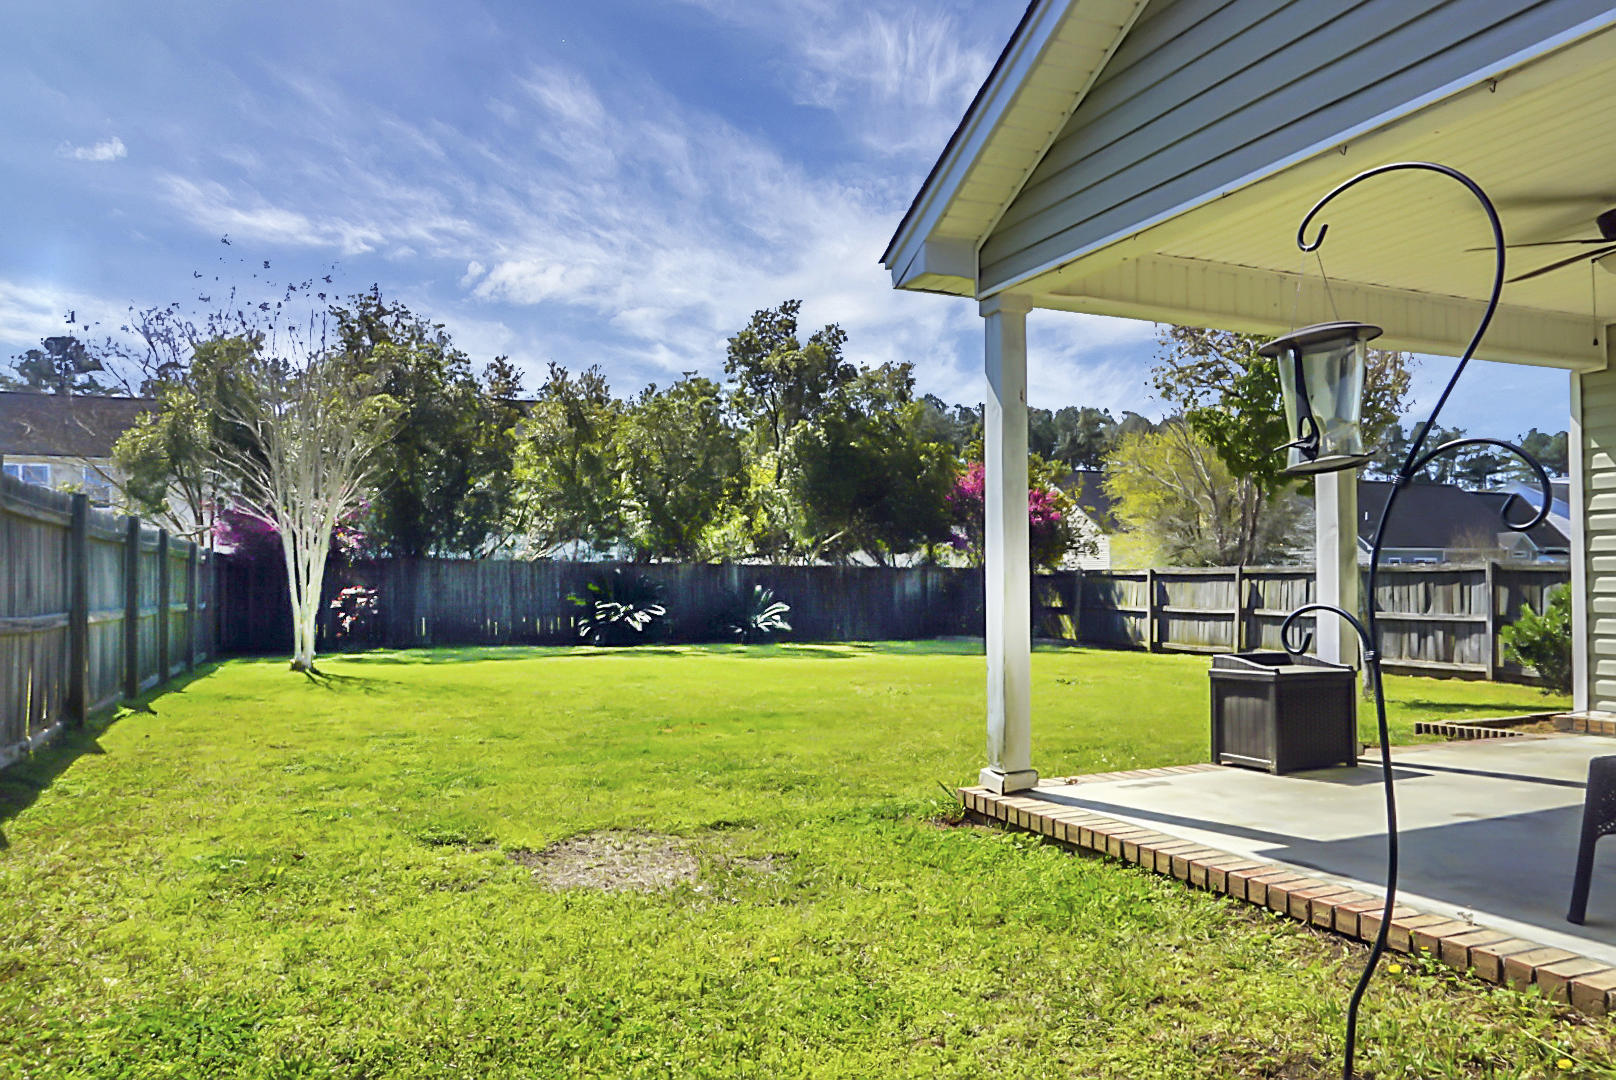 172 Antebellum Way Summerville, SC 29483